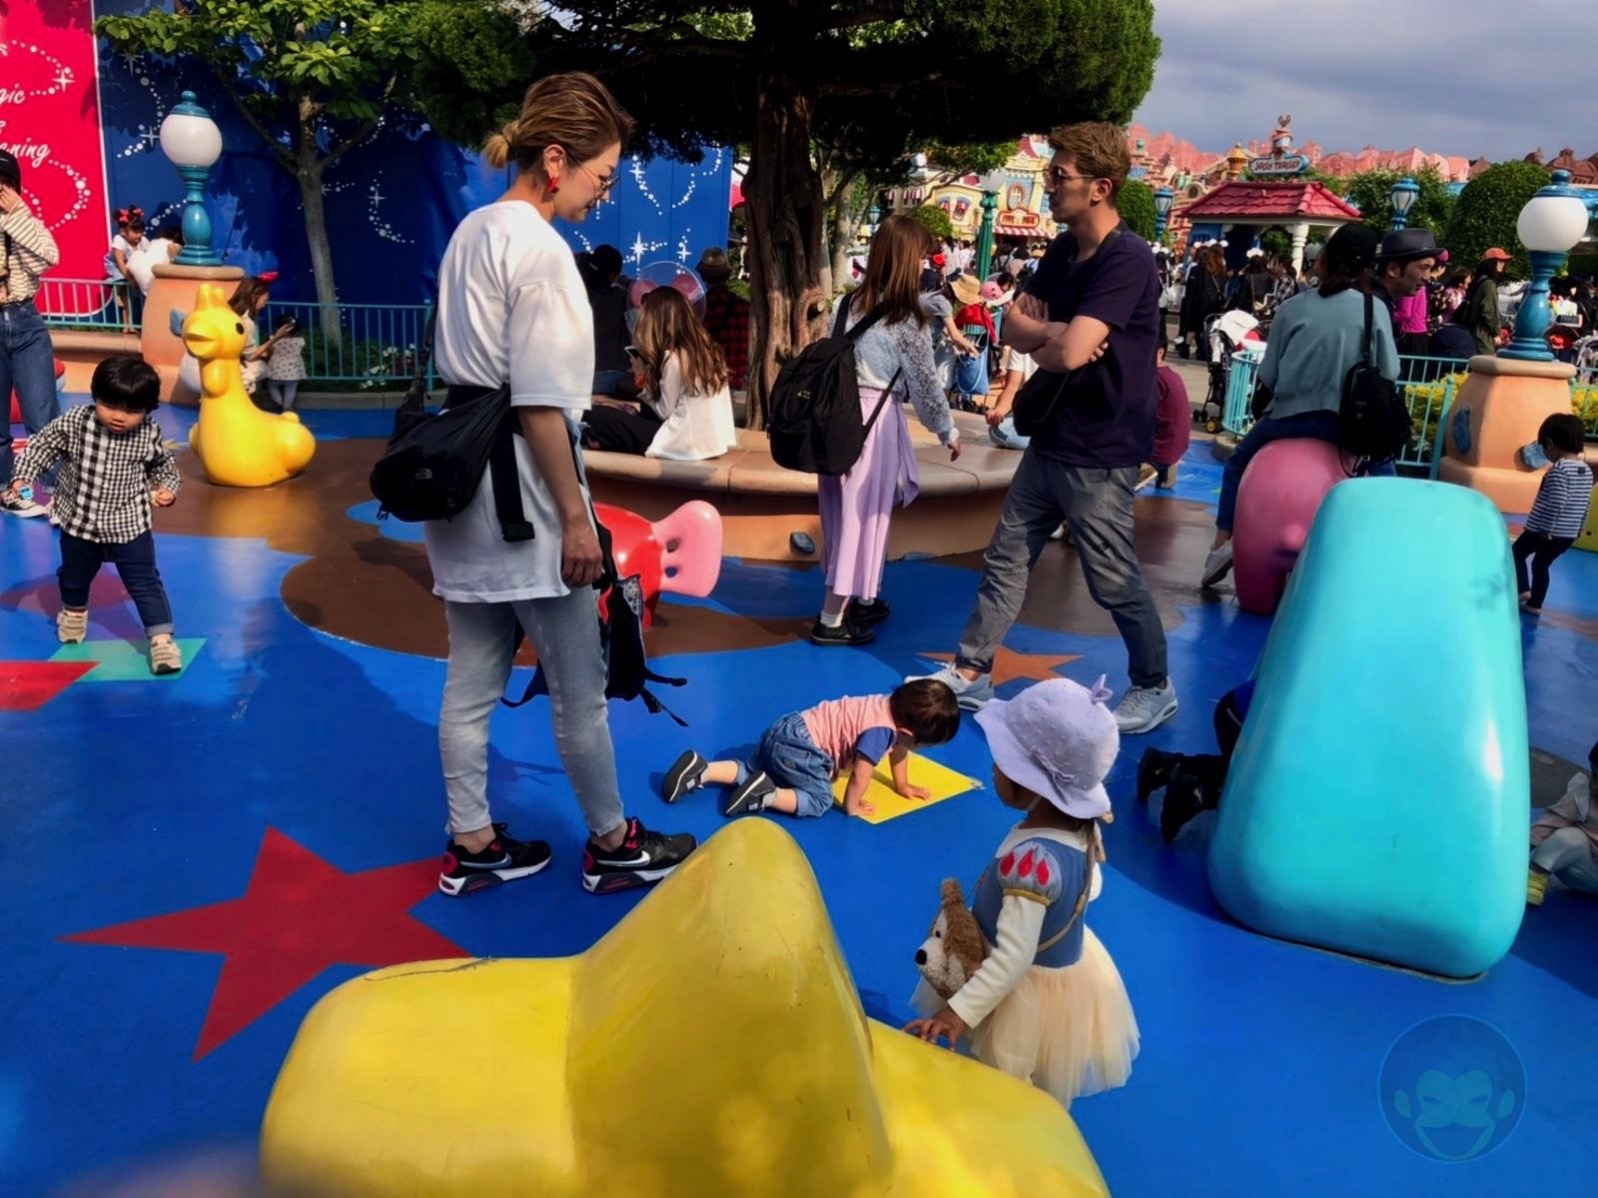 Tokyo-Disney-Land-with-2yr-old-daughter-toon-town-01.jpg